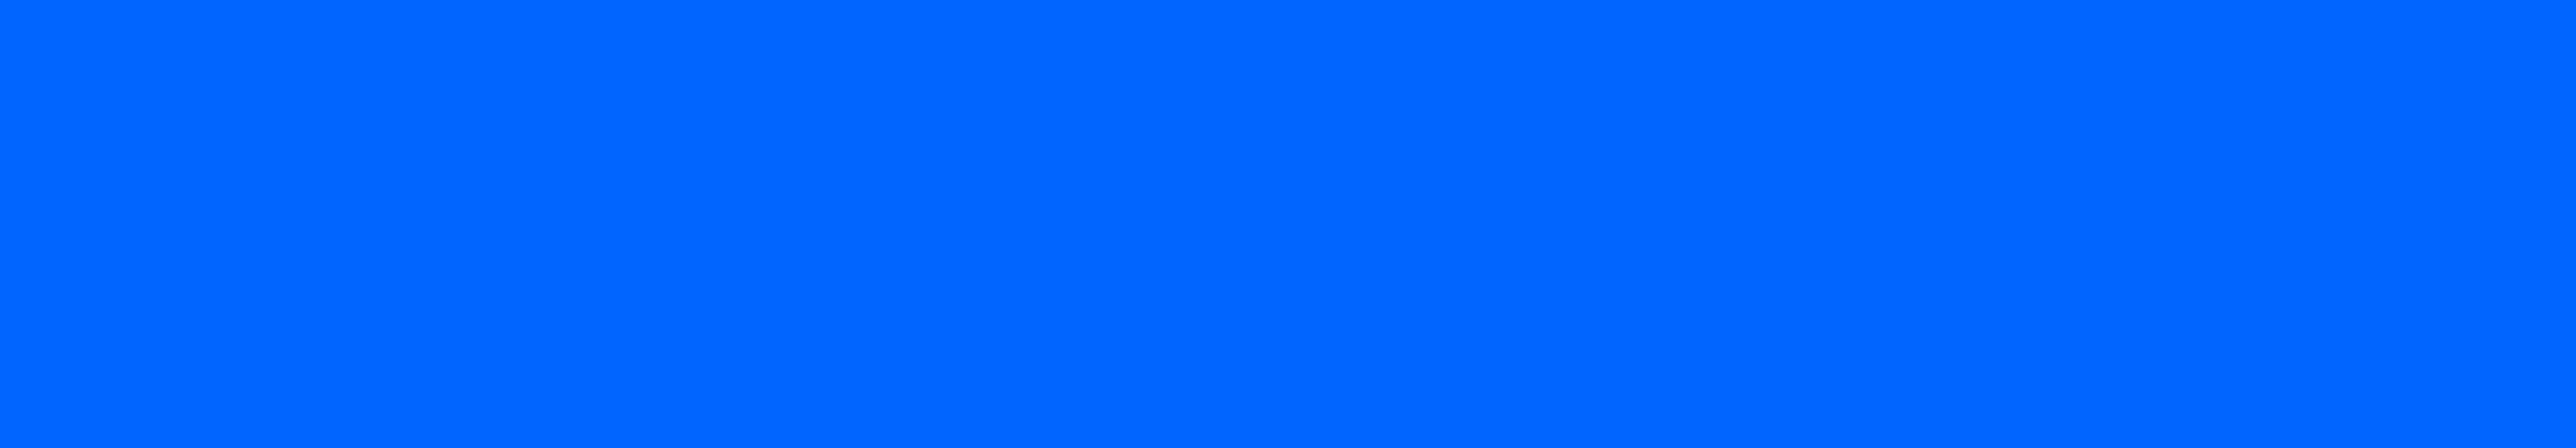 telefonica-tech-logo-positive